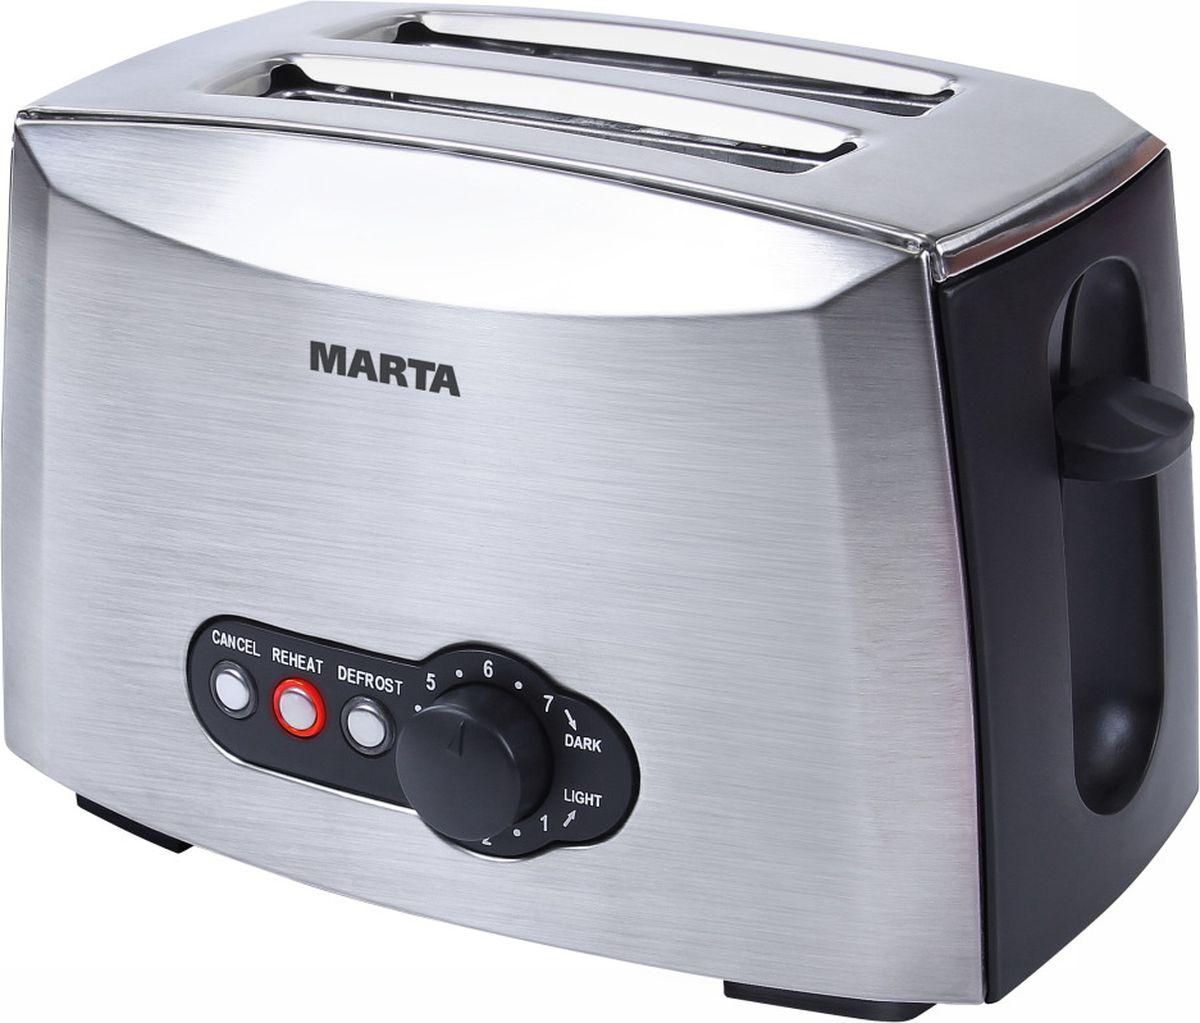 Marta MT-1705, Black Pearl тостер - Тостеры